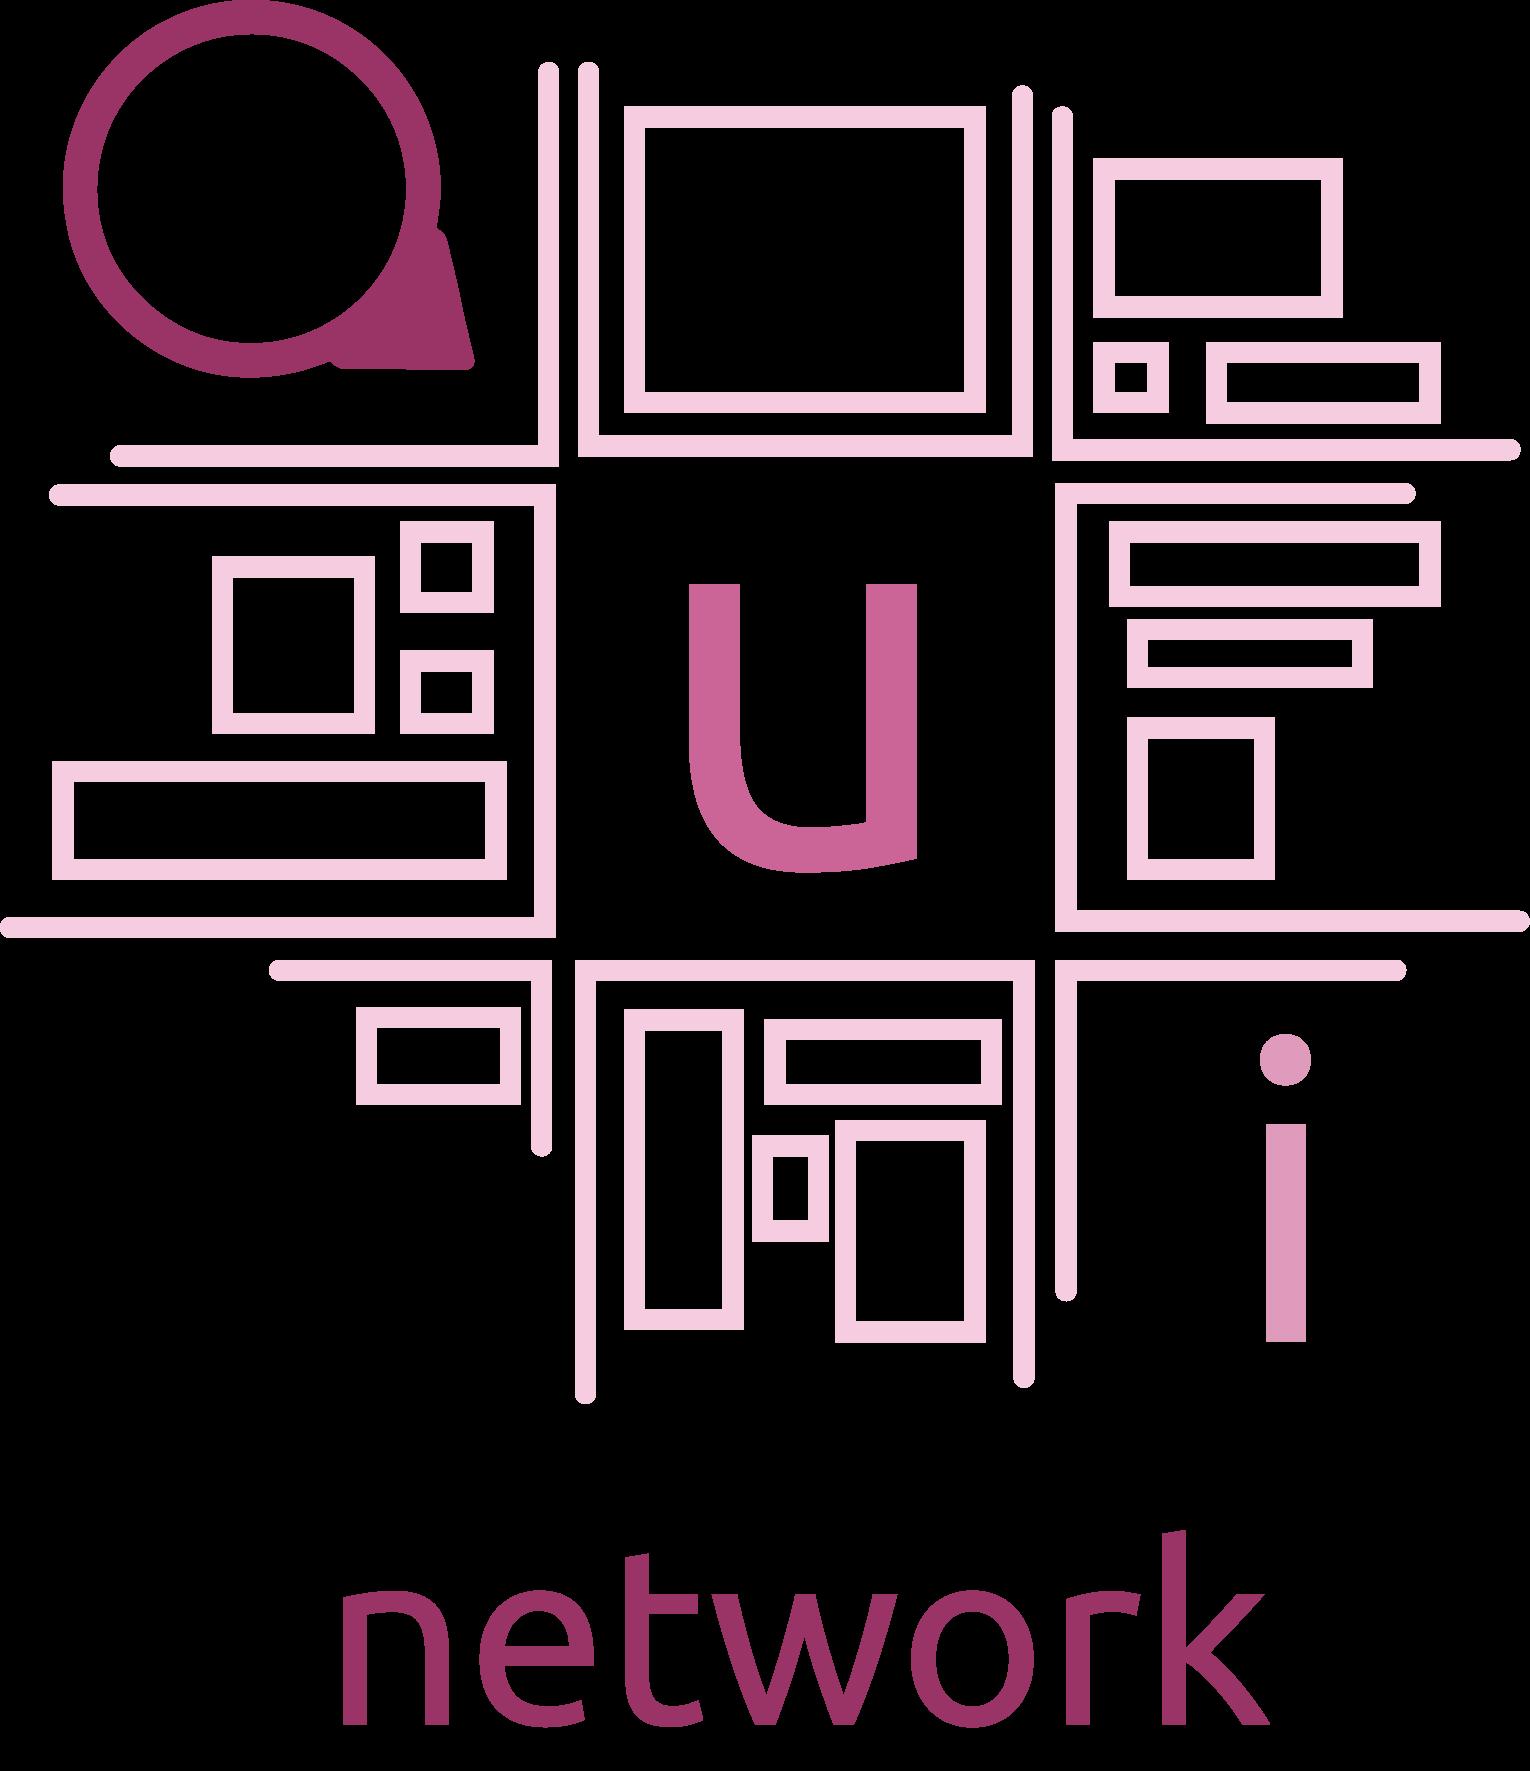 Qui network